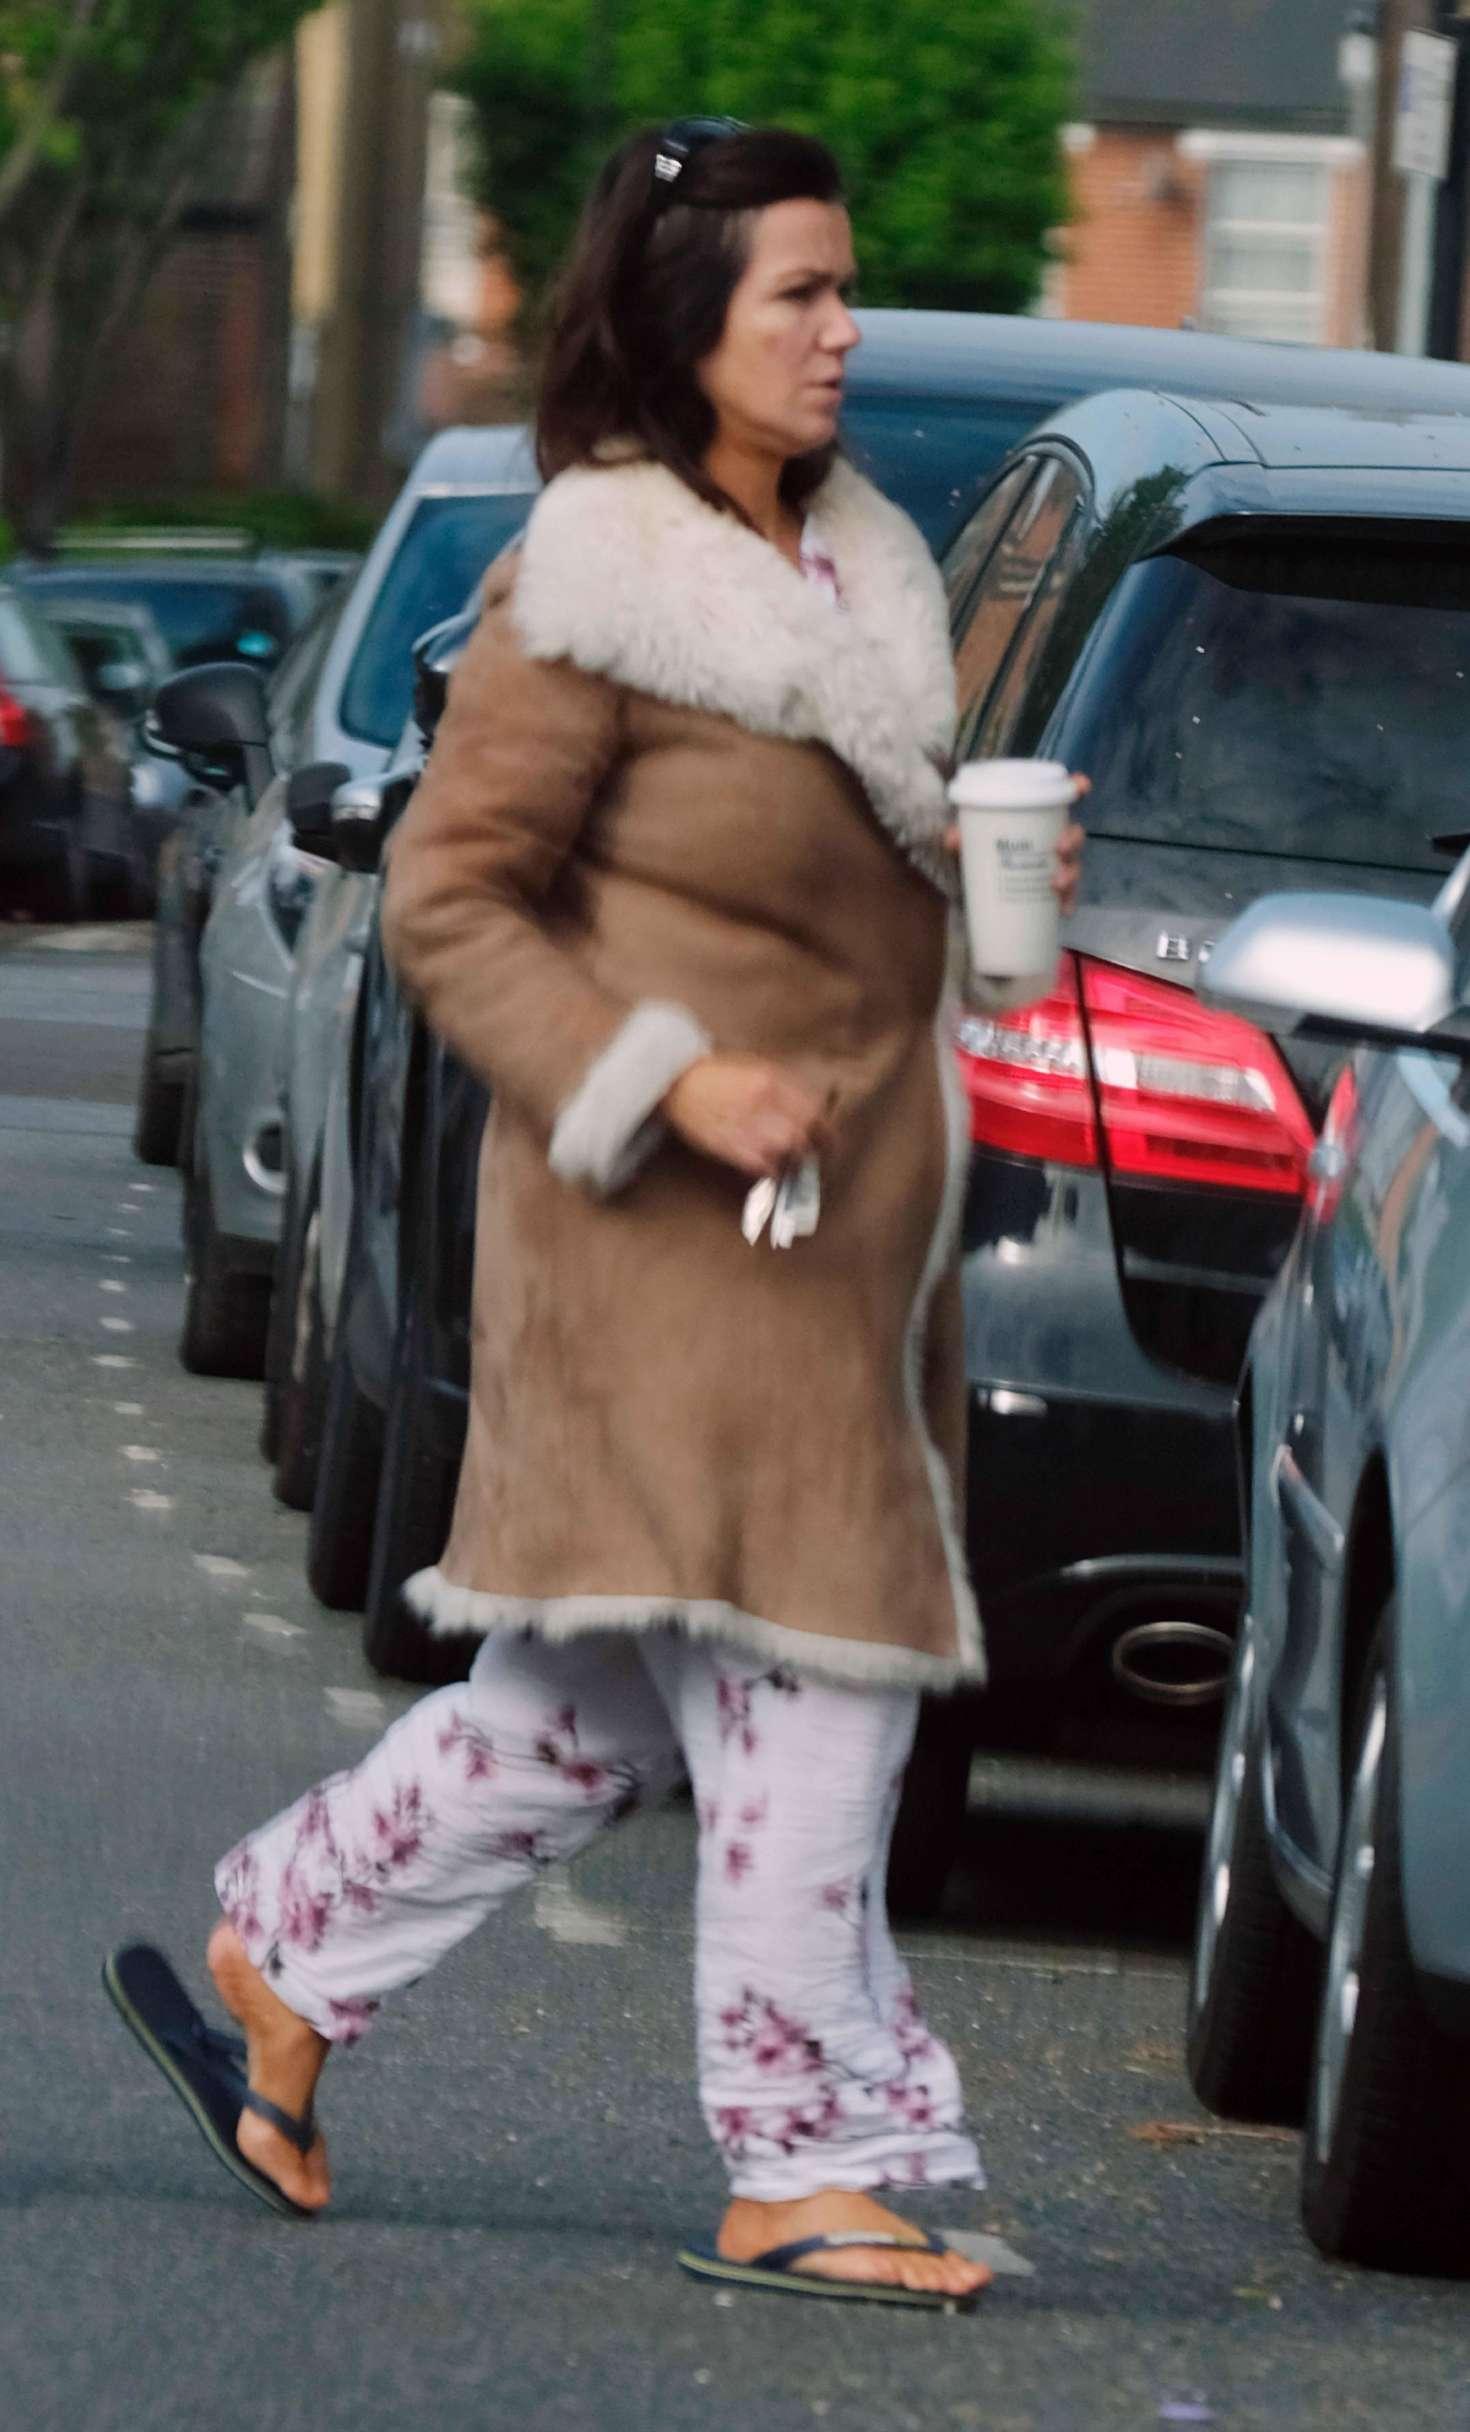 Susanna reid in her pyjamas out in london nude (67 pics)